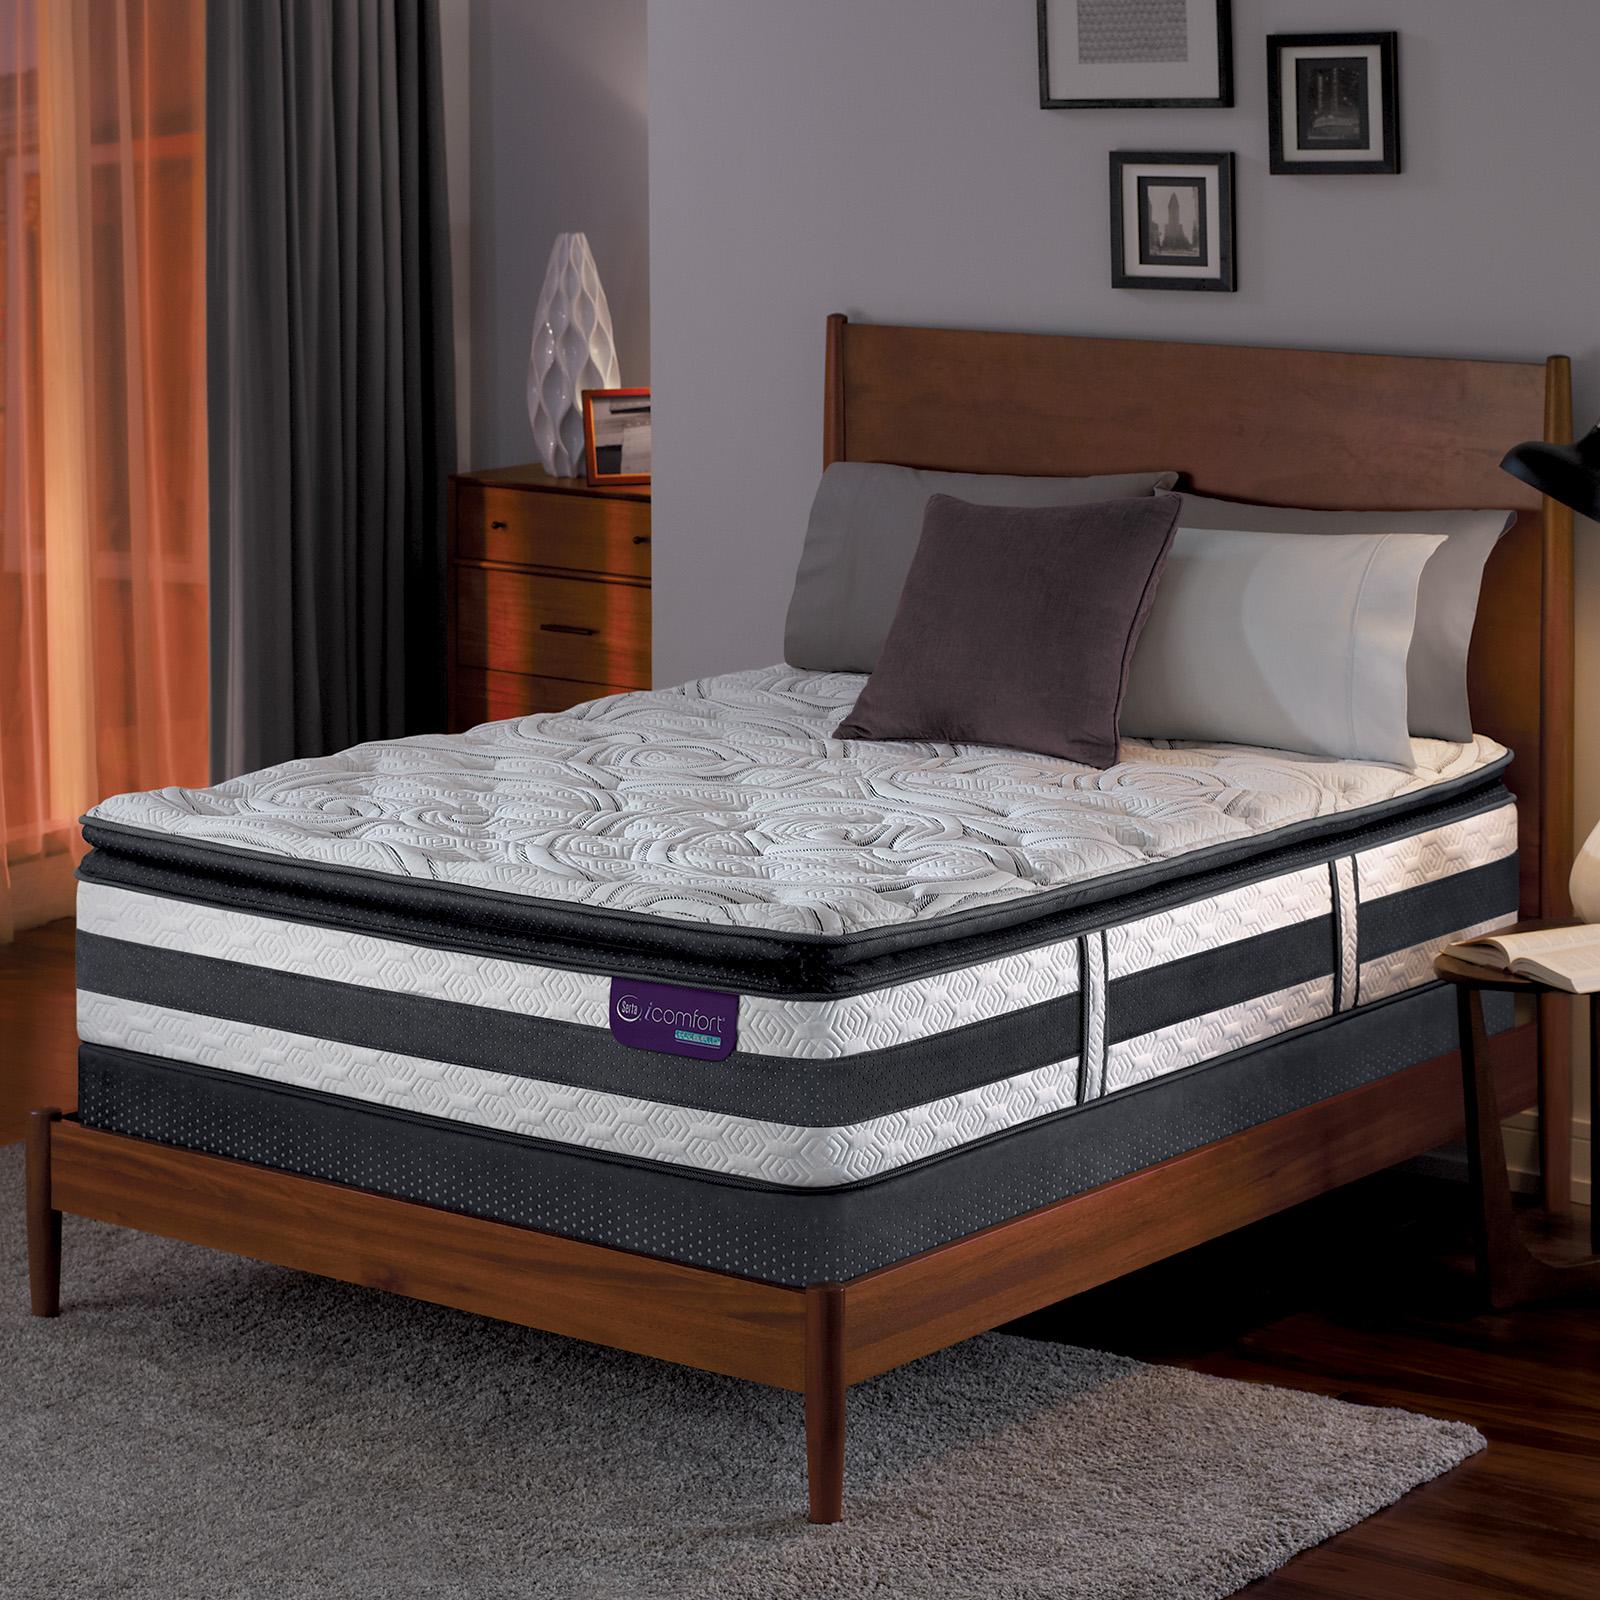 Serta Hybrid Observer King Super Pillowtop Mattress